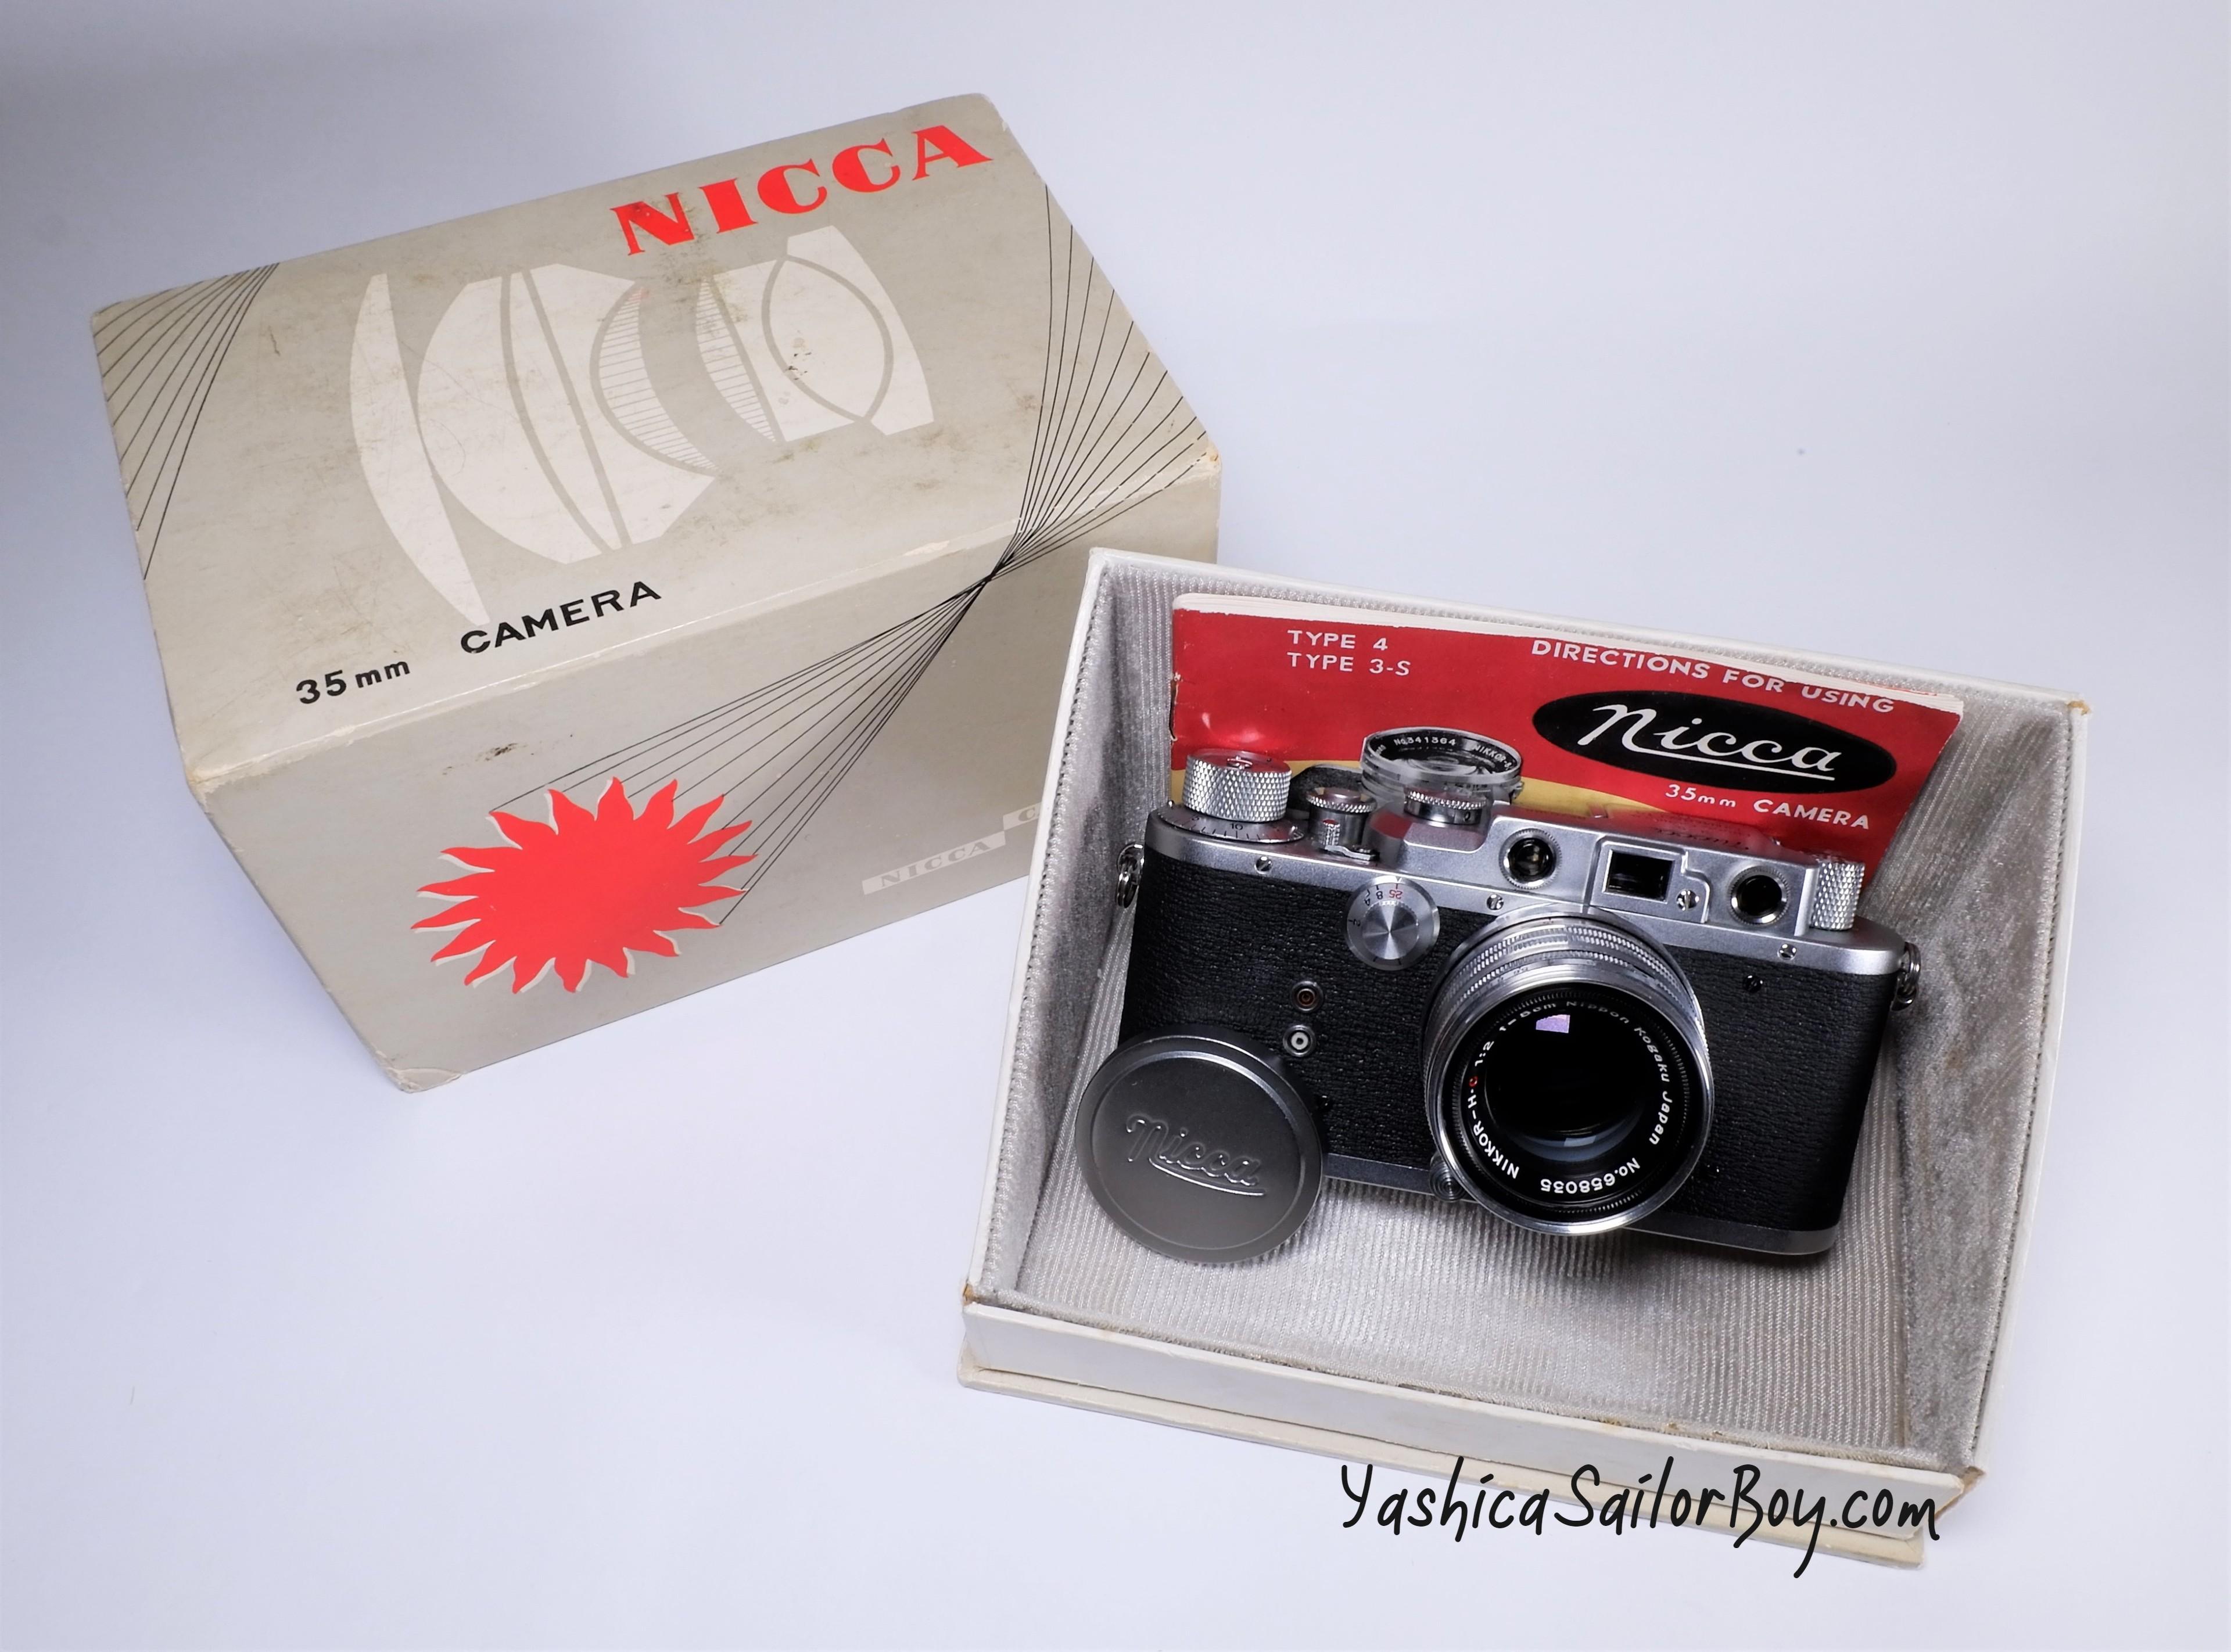 Nicca Box with Camera